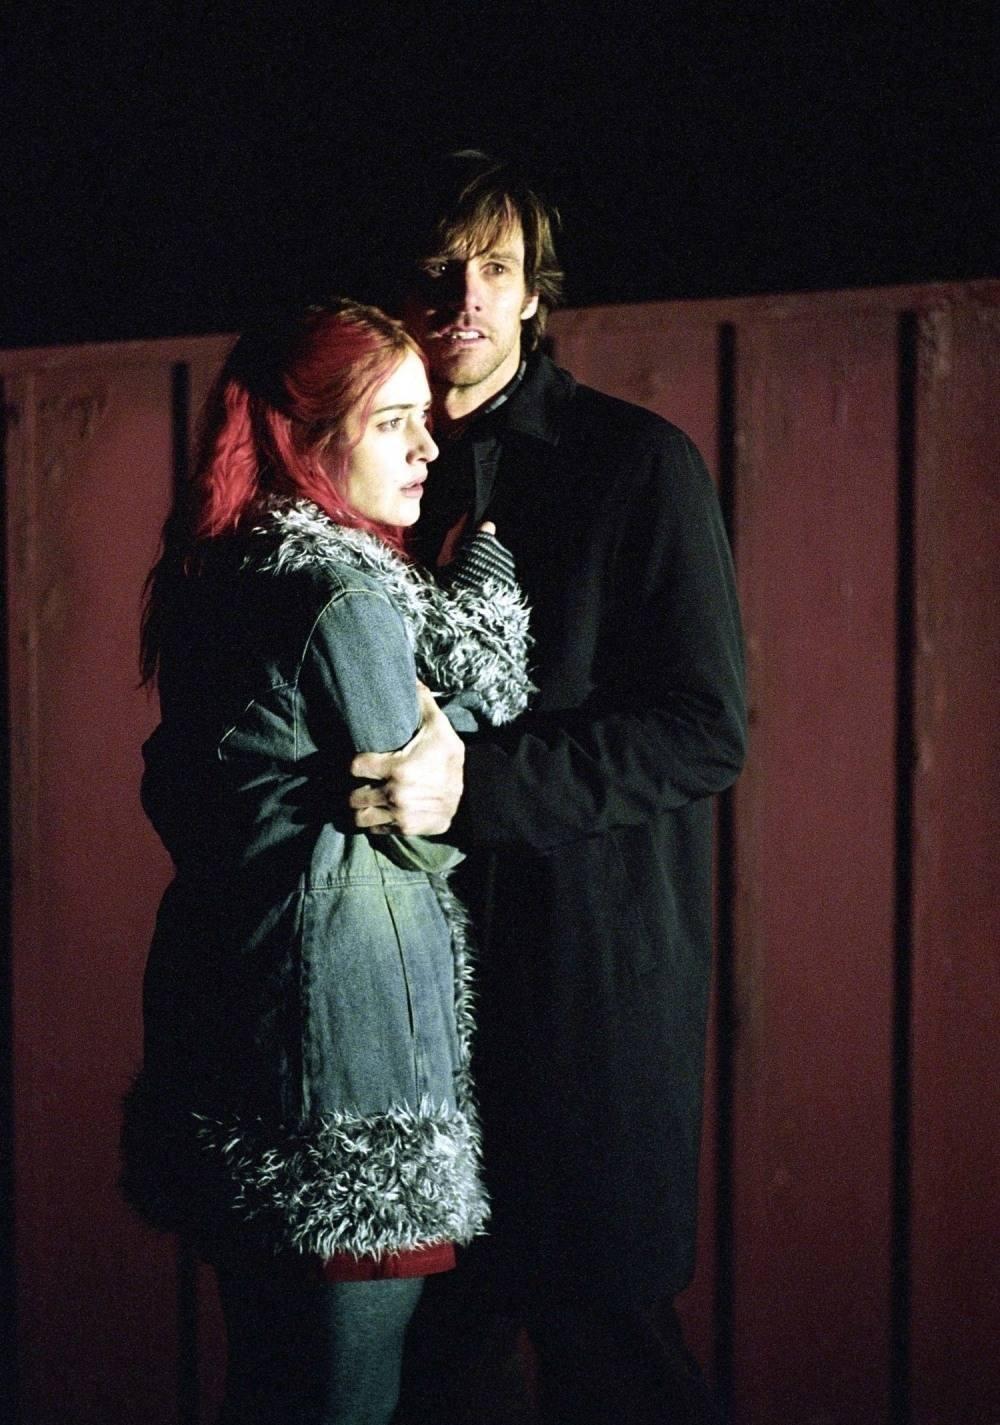 Egy Makulatlan Elme Orok Ragyogasa Eternal Sunshine Of The Spotless Mind 2004 Mafab Hu